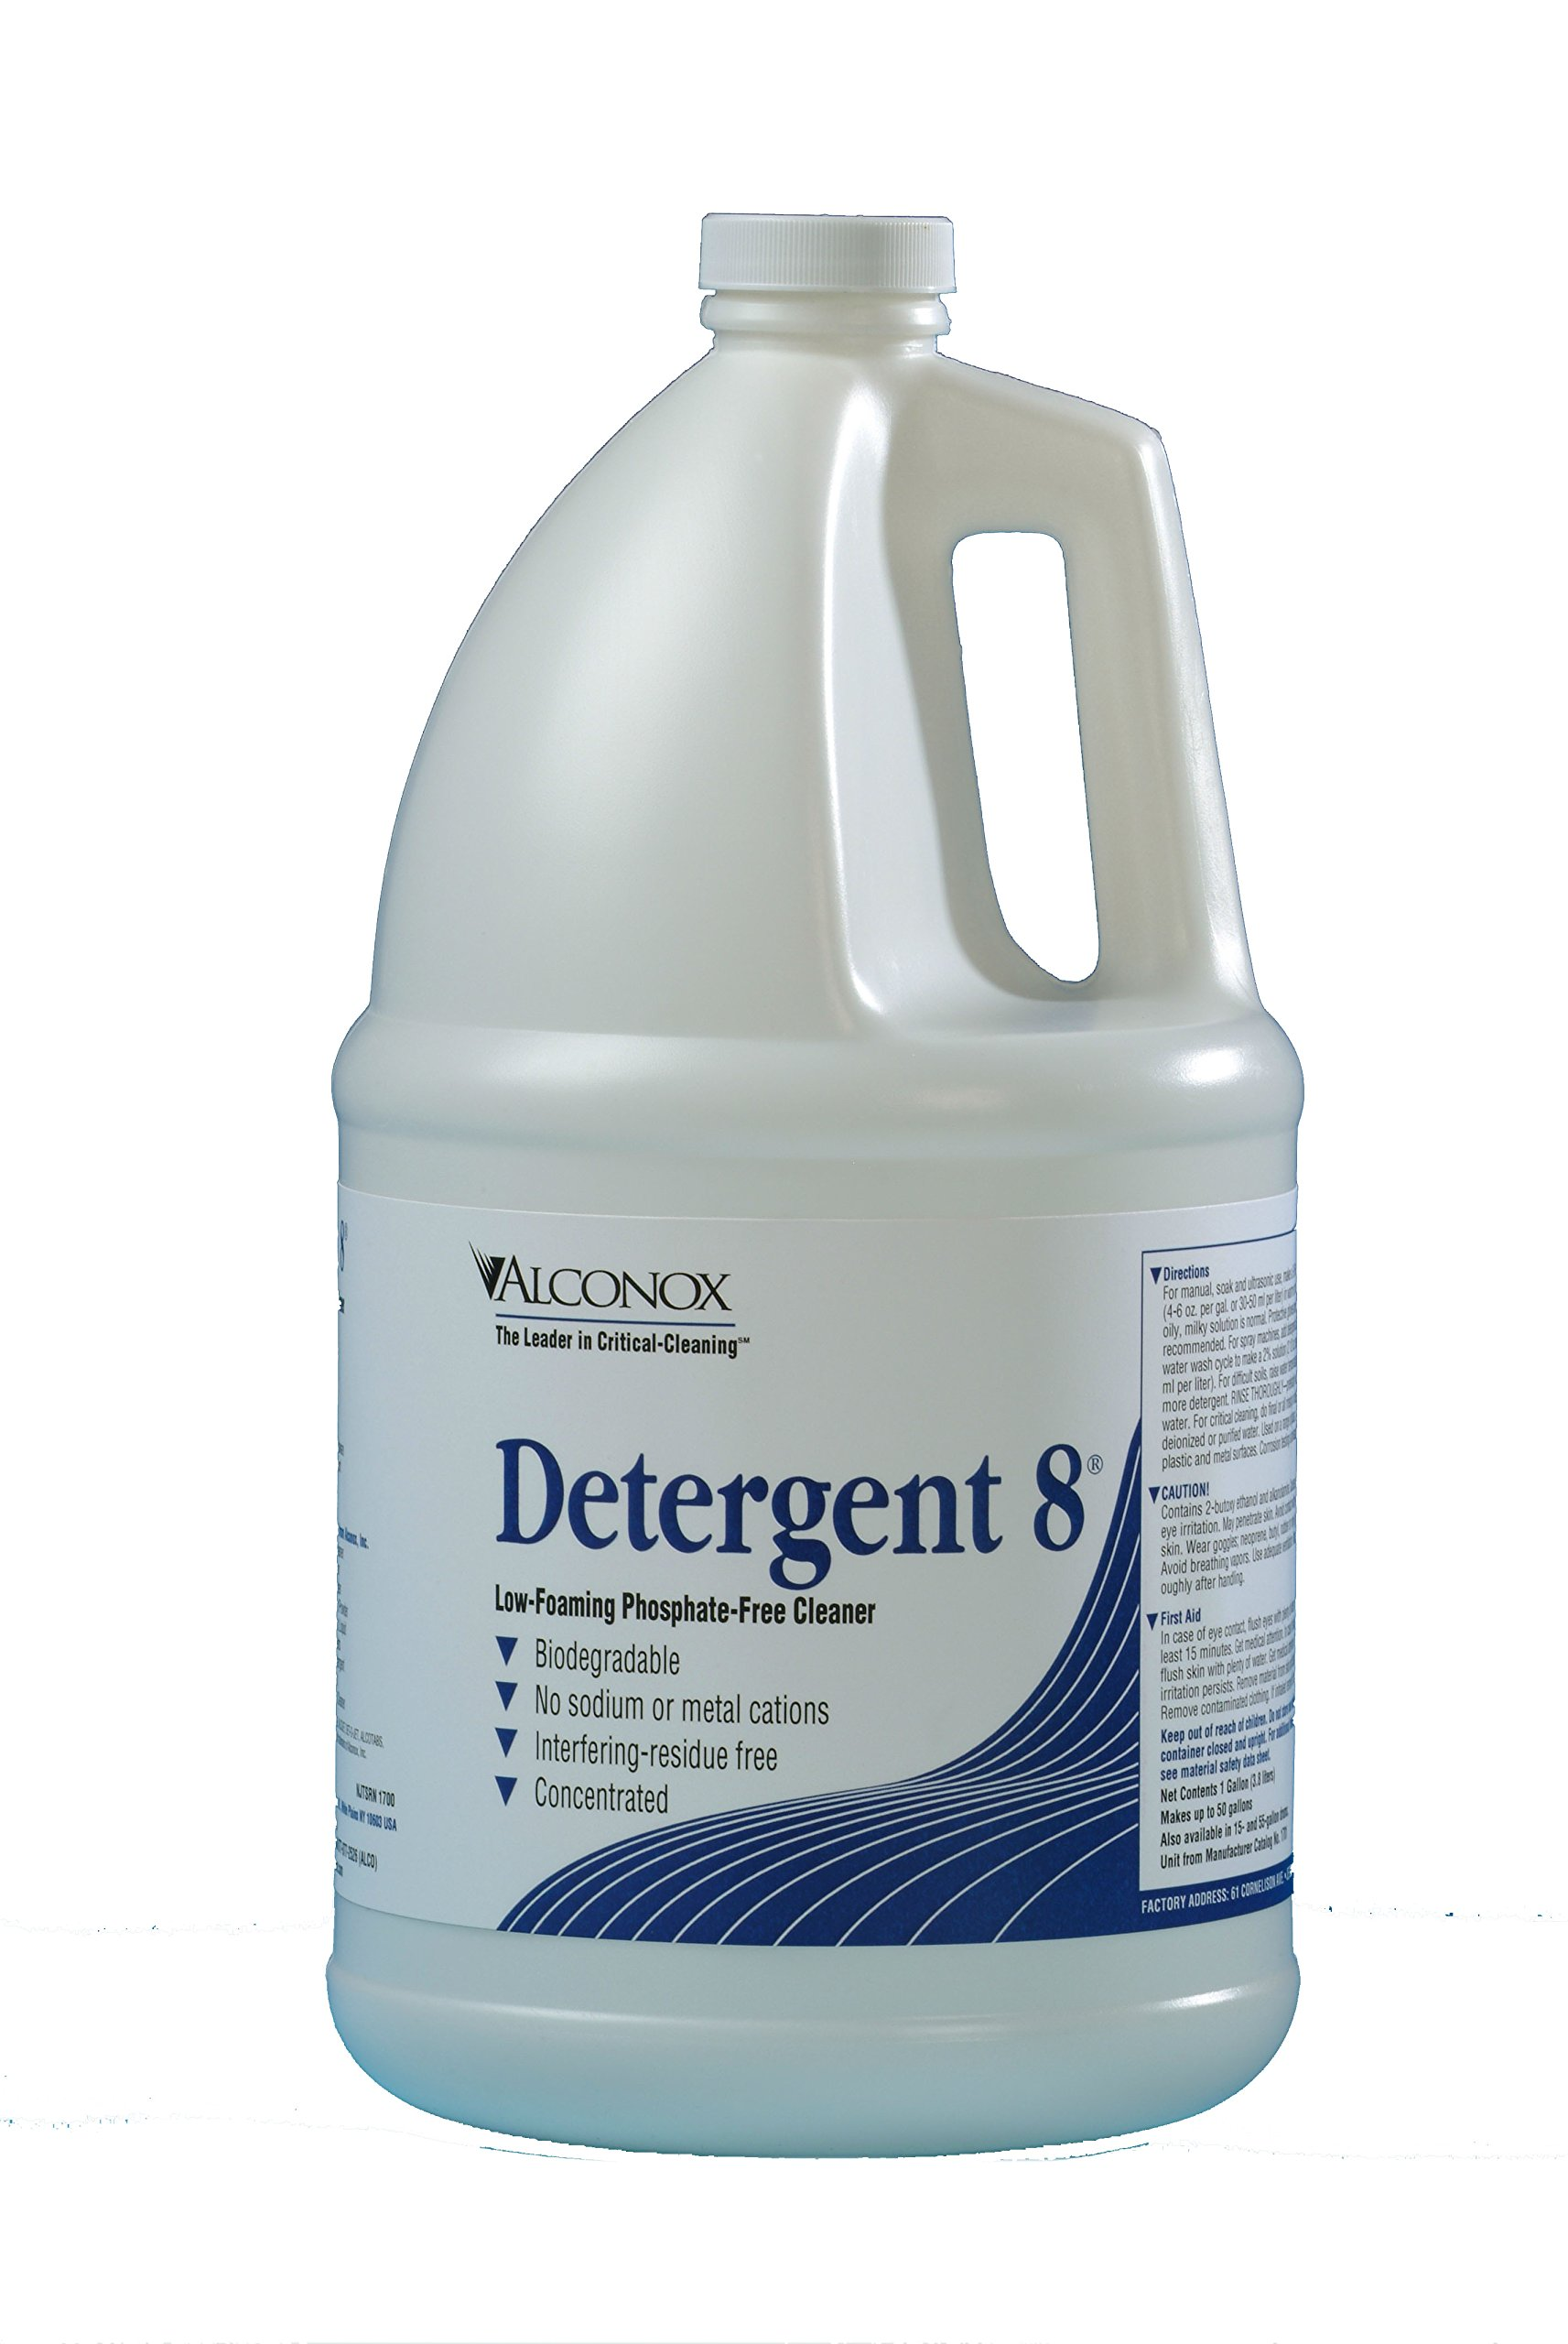 Alconox 1701 Detergent 8 Low Foaming Phosphate Free Detergent, 1 Gallon Bottle (Case of 4)